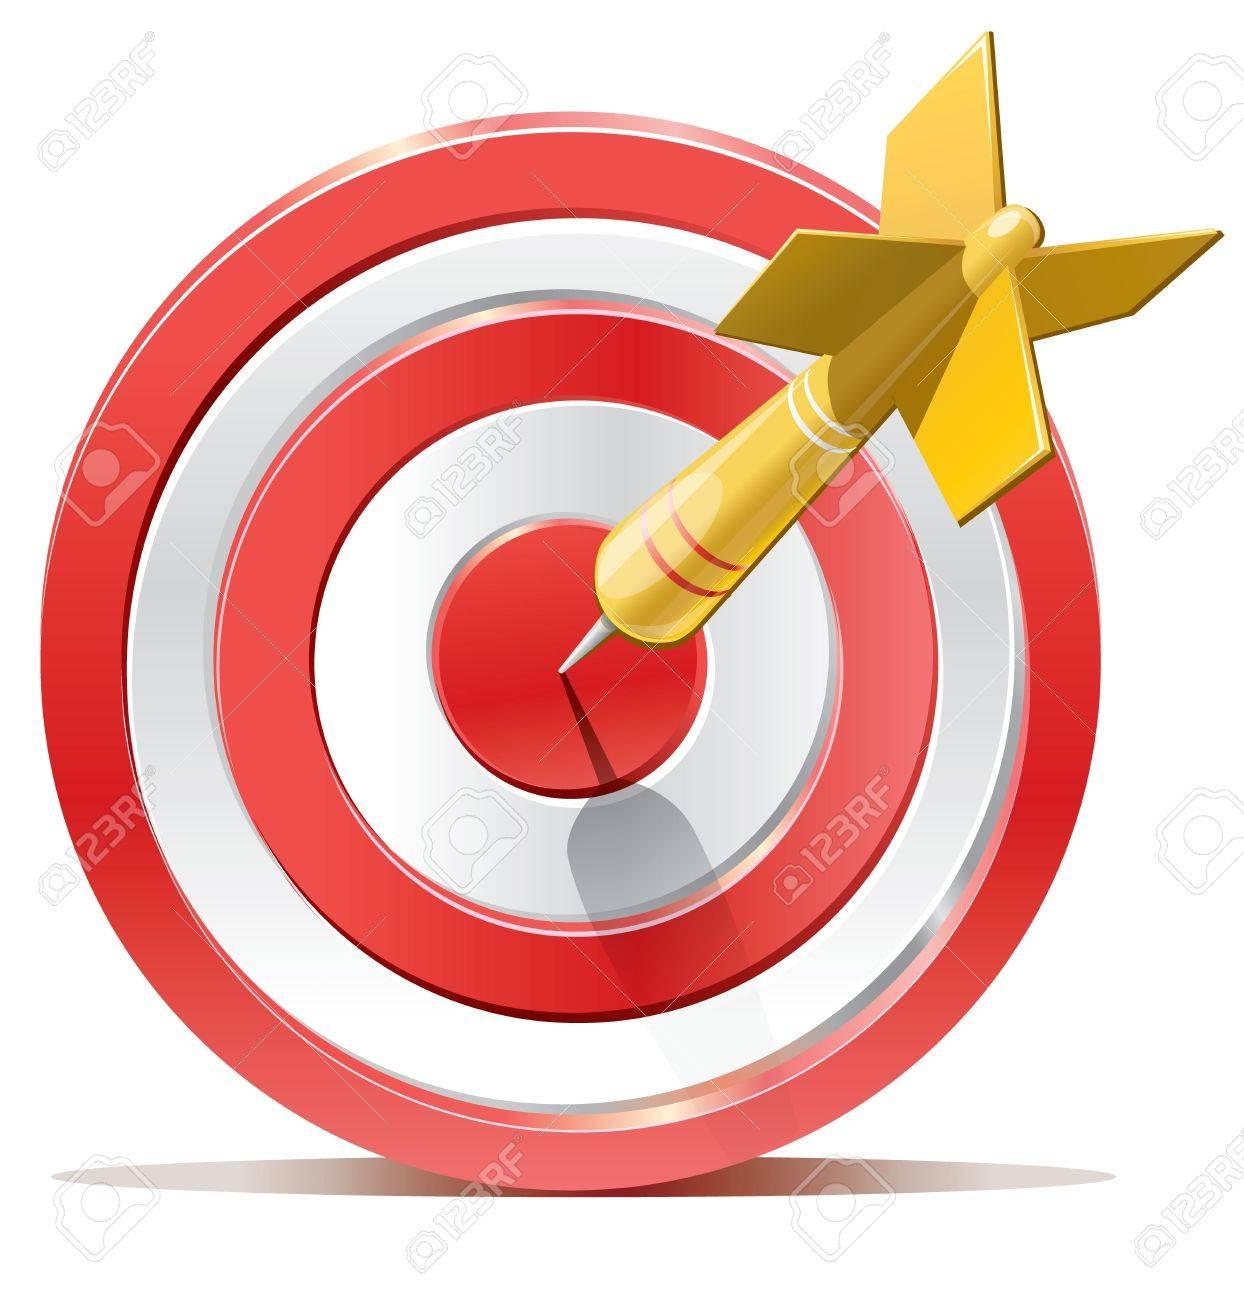 Red darts target aim Stock Vector - 19449203